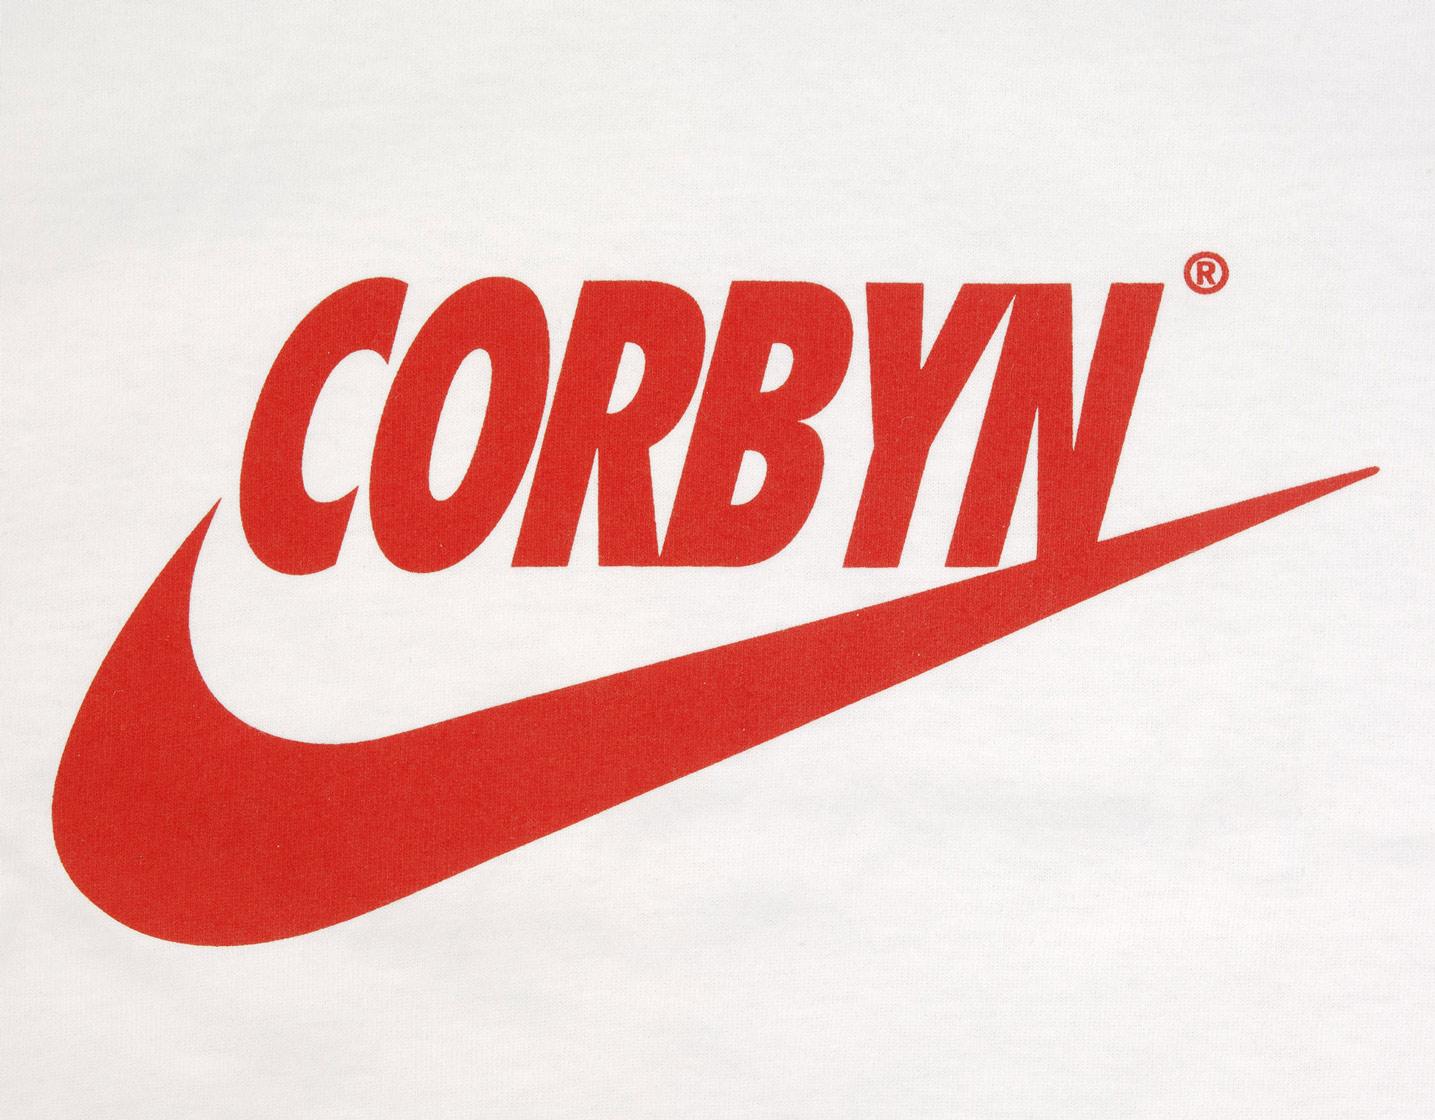 Bristol Street Wear's 'Corbyn' T-shirt